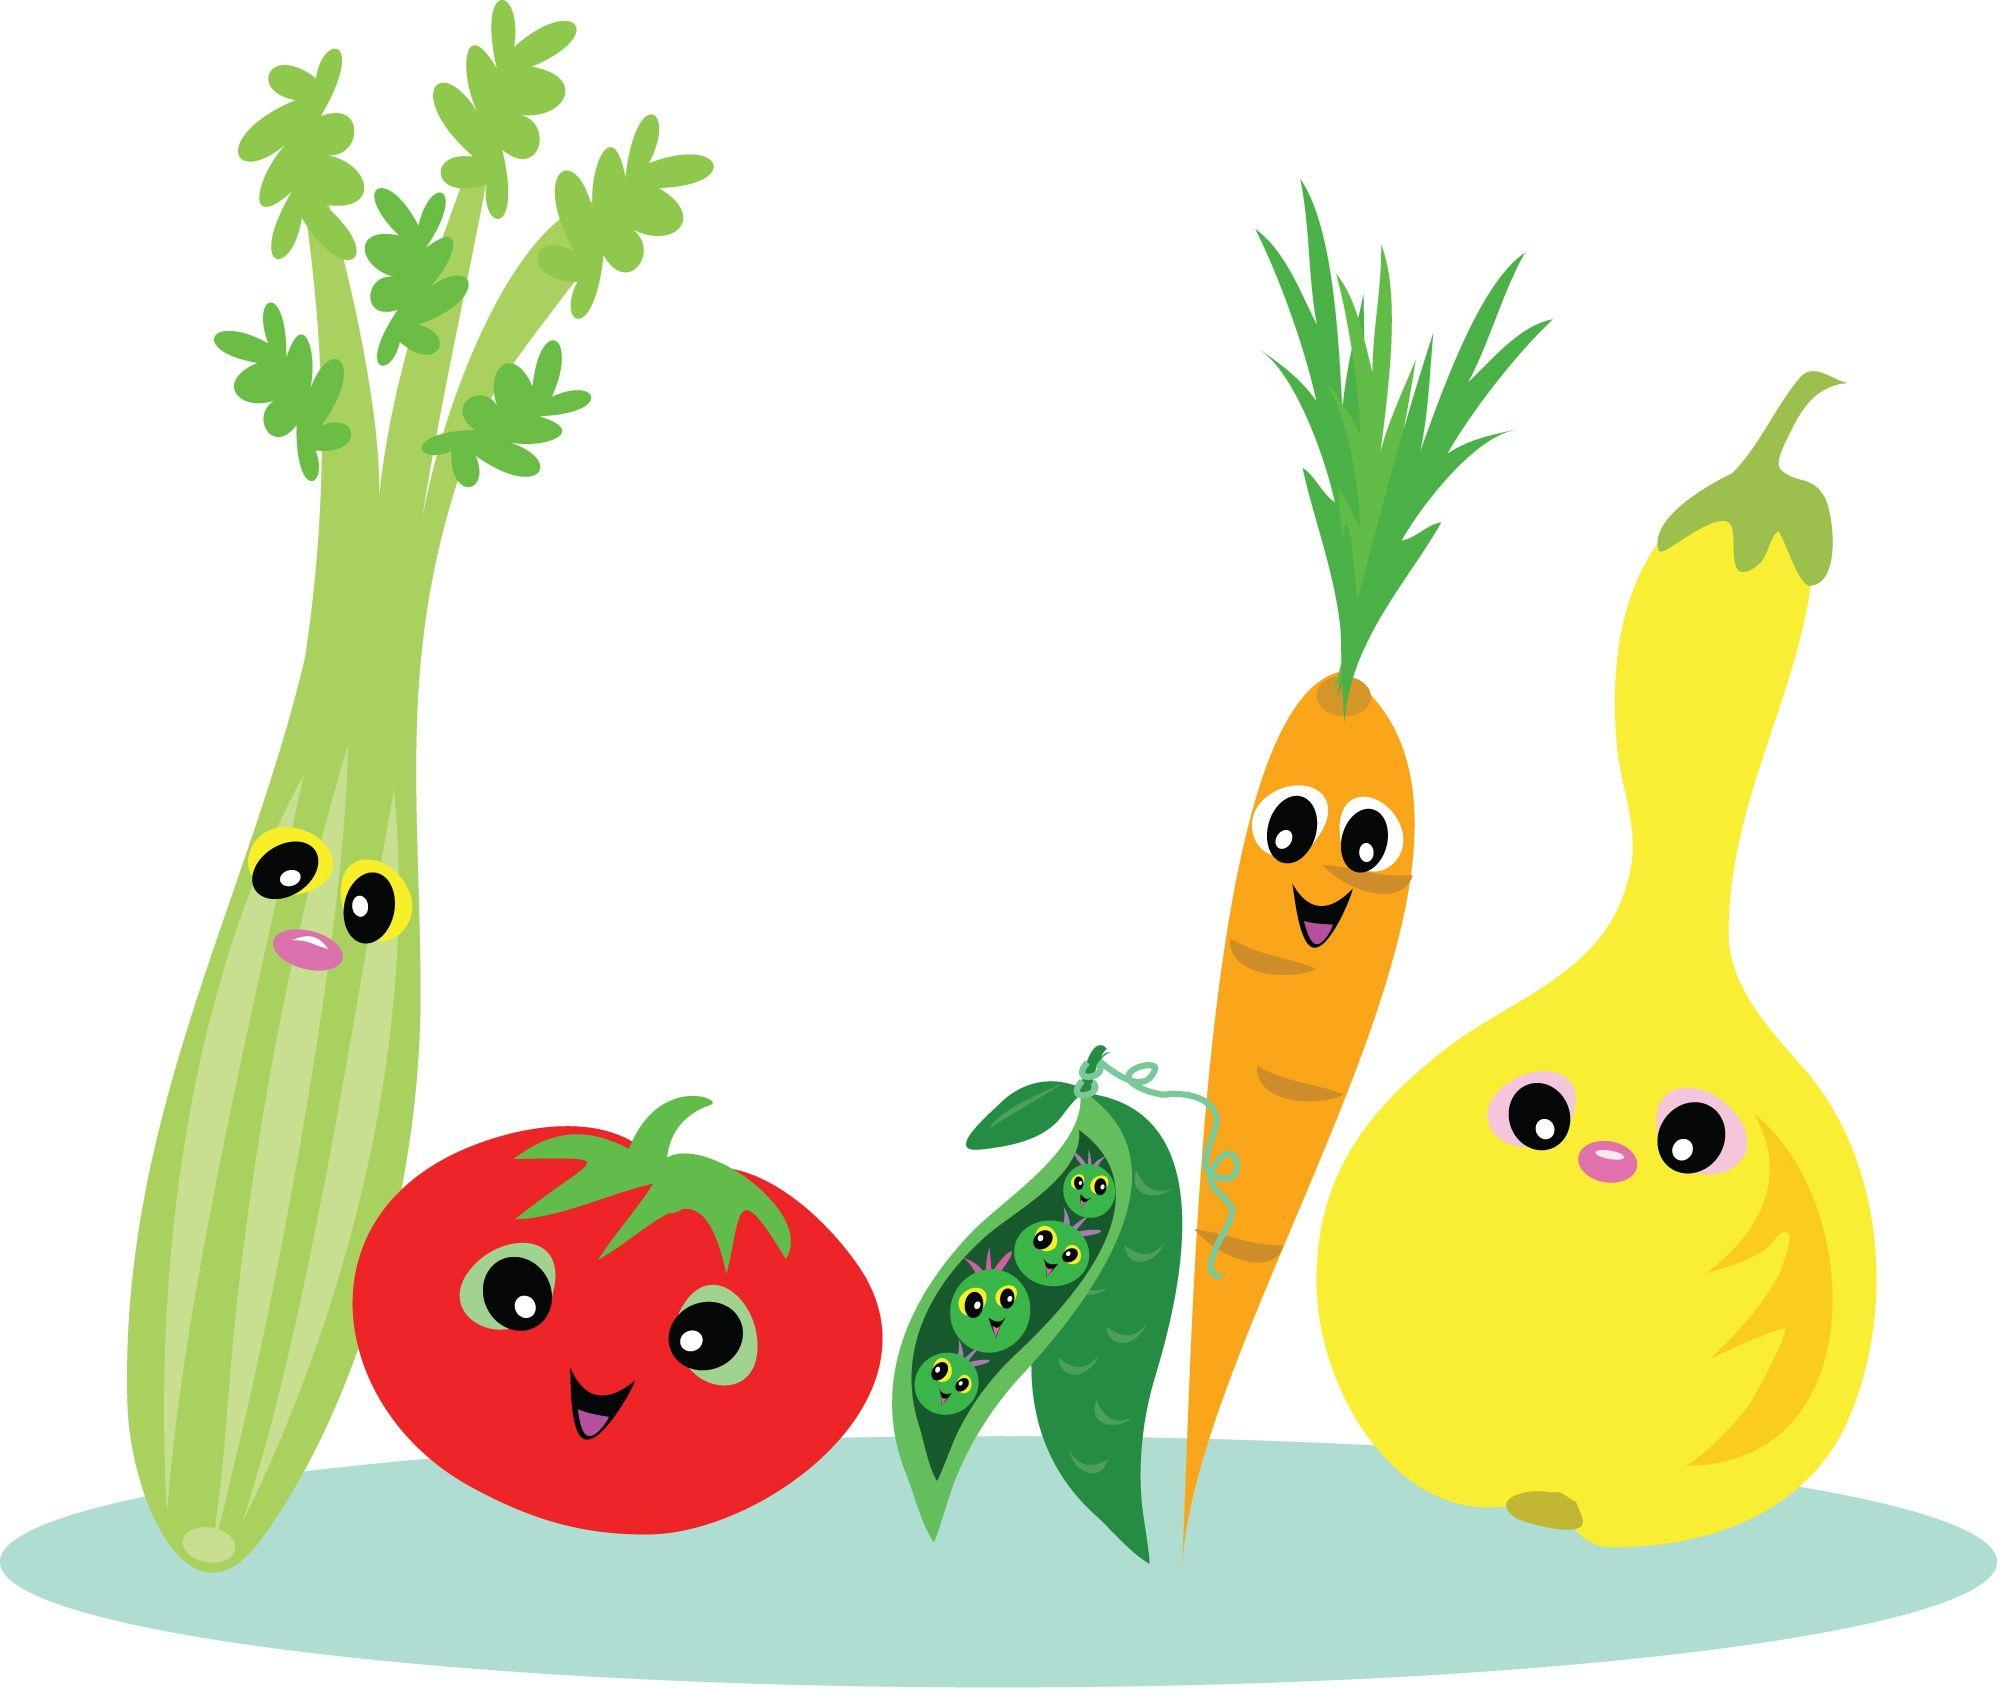 Healthy living clipart image free Healthy Food Cartoon Clip Art How To Make Vitamins Work myherbalmart ... image free